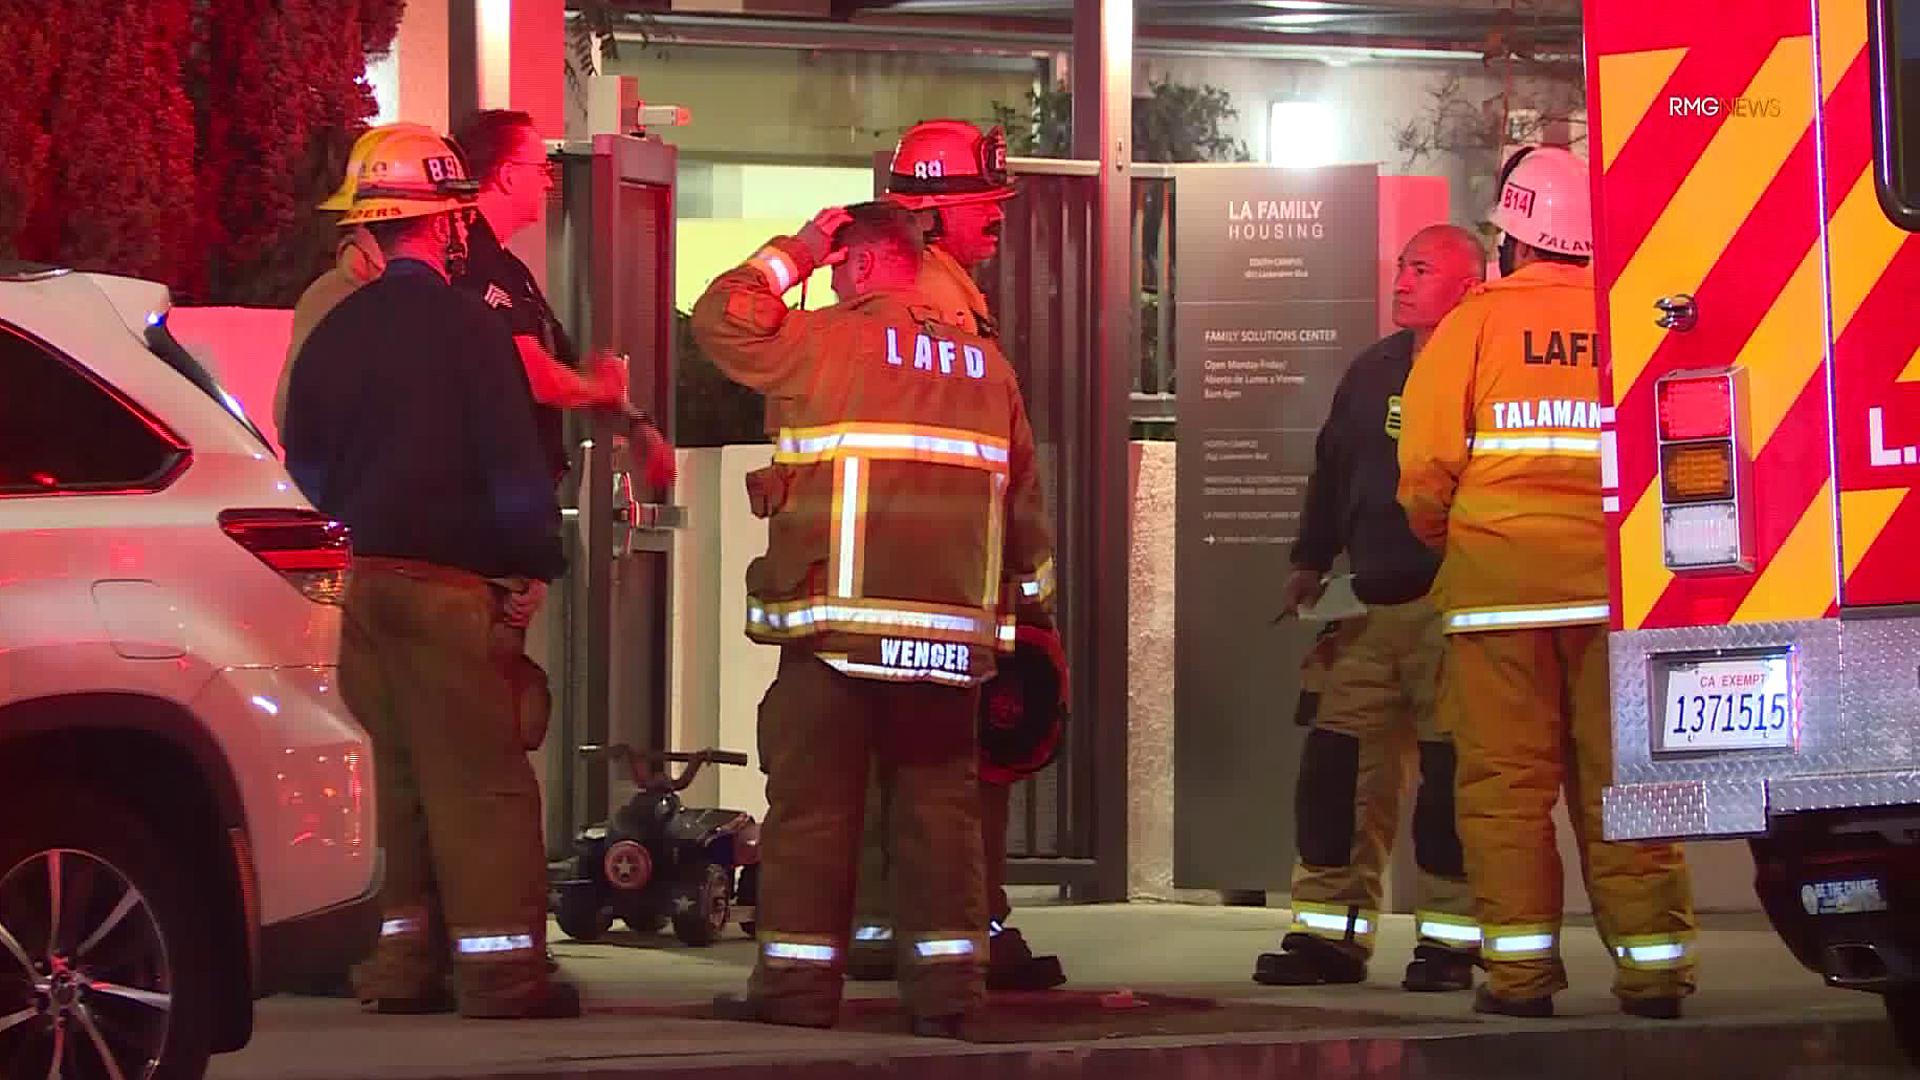 Crews respond to a hazmat situation in Sun Valley on Nov. 11, 2019. (Credit: RMG News)